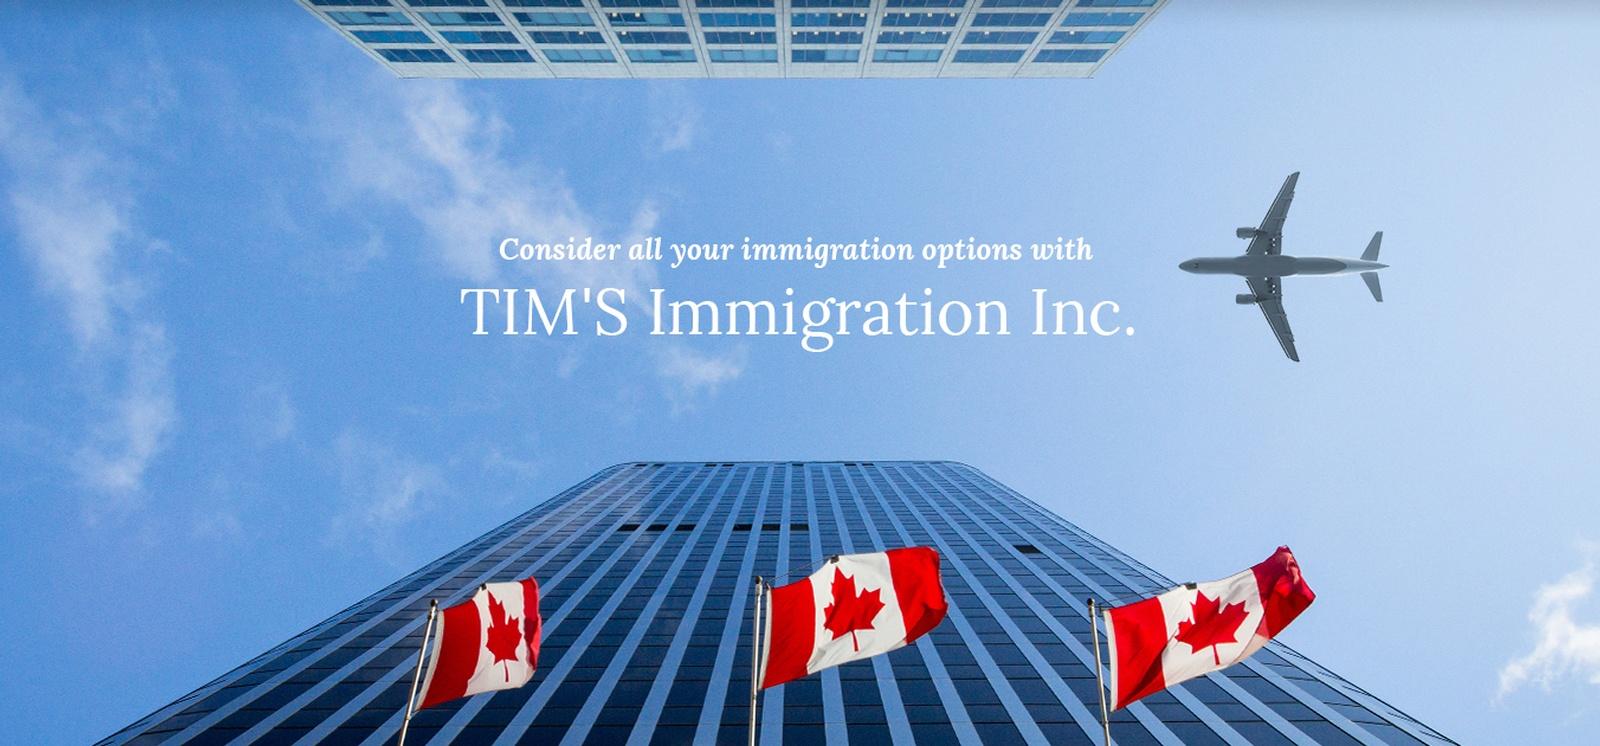 imigration Company Toronto